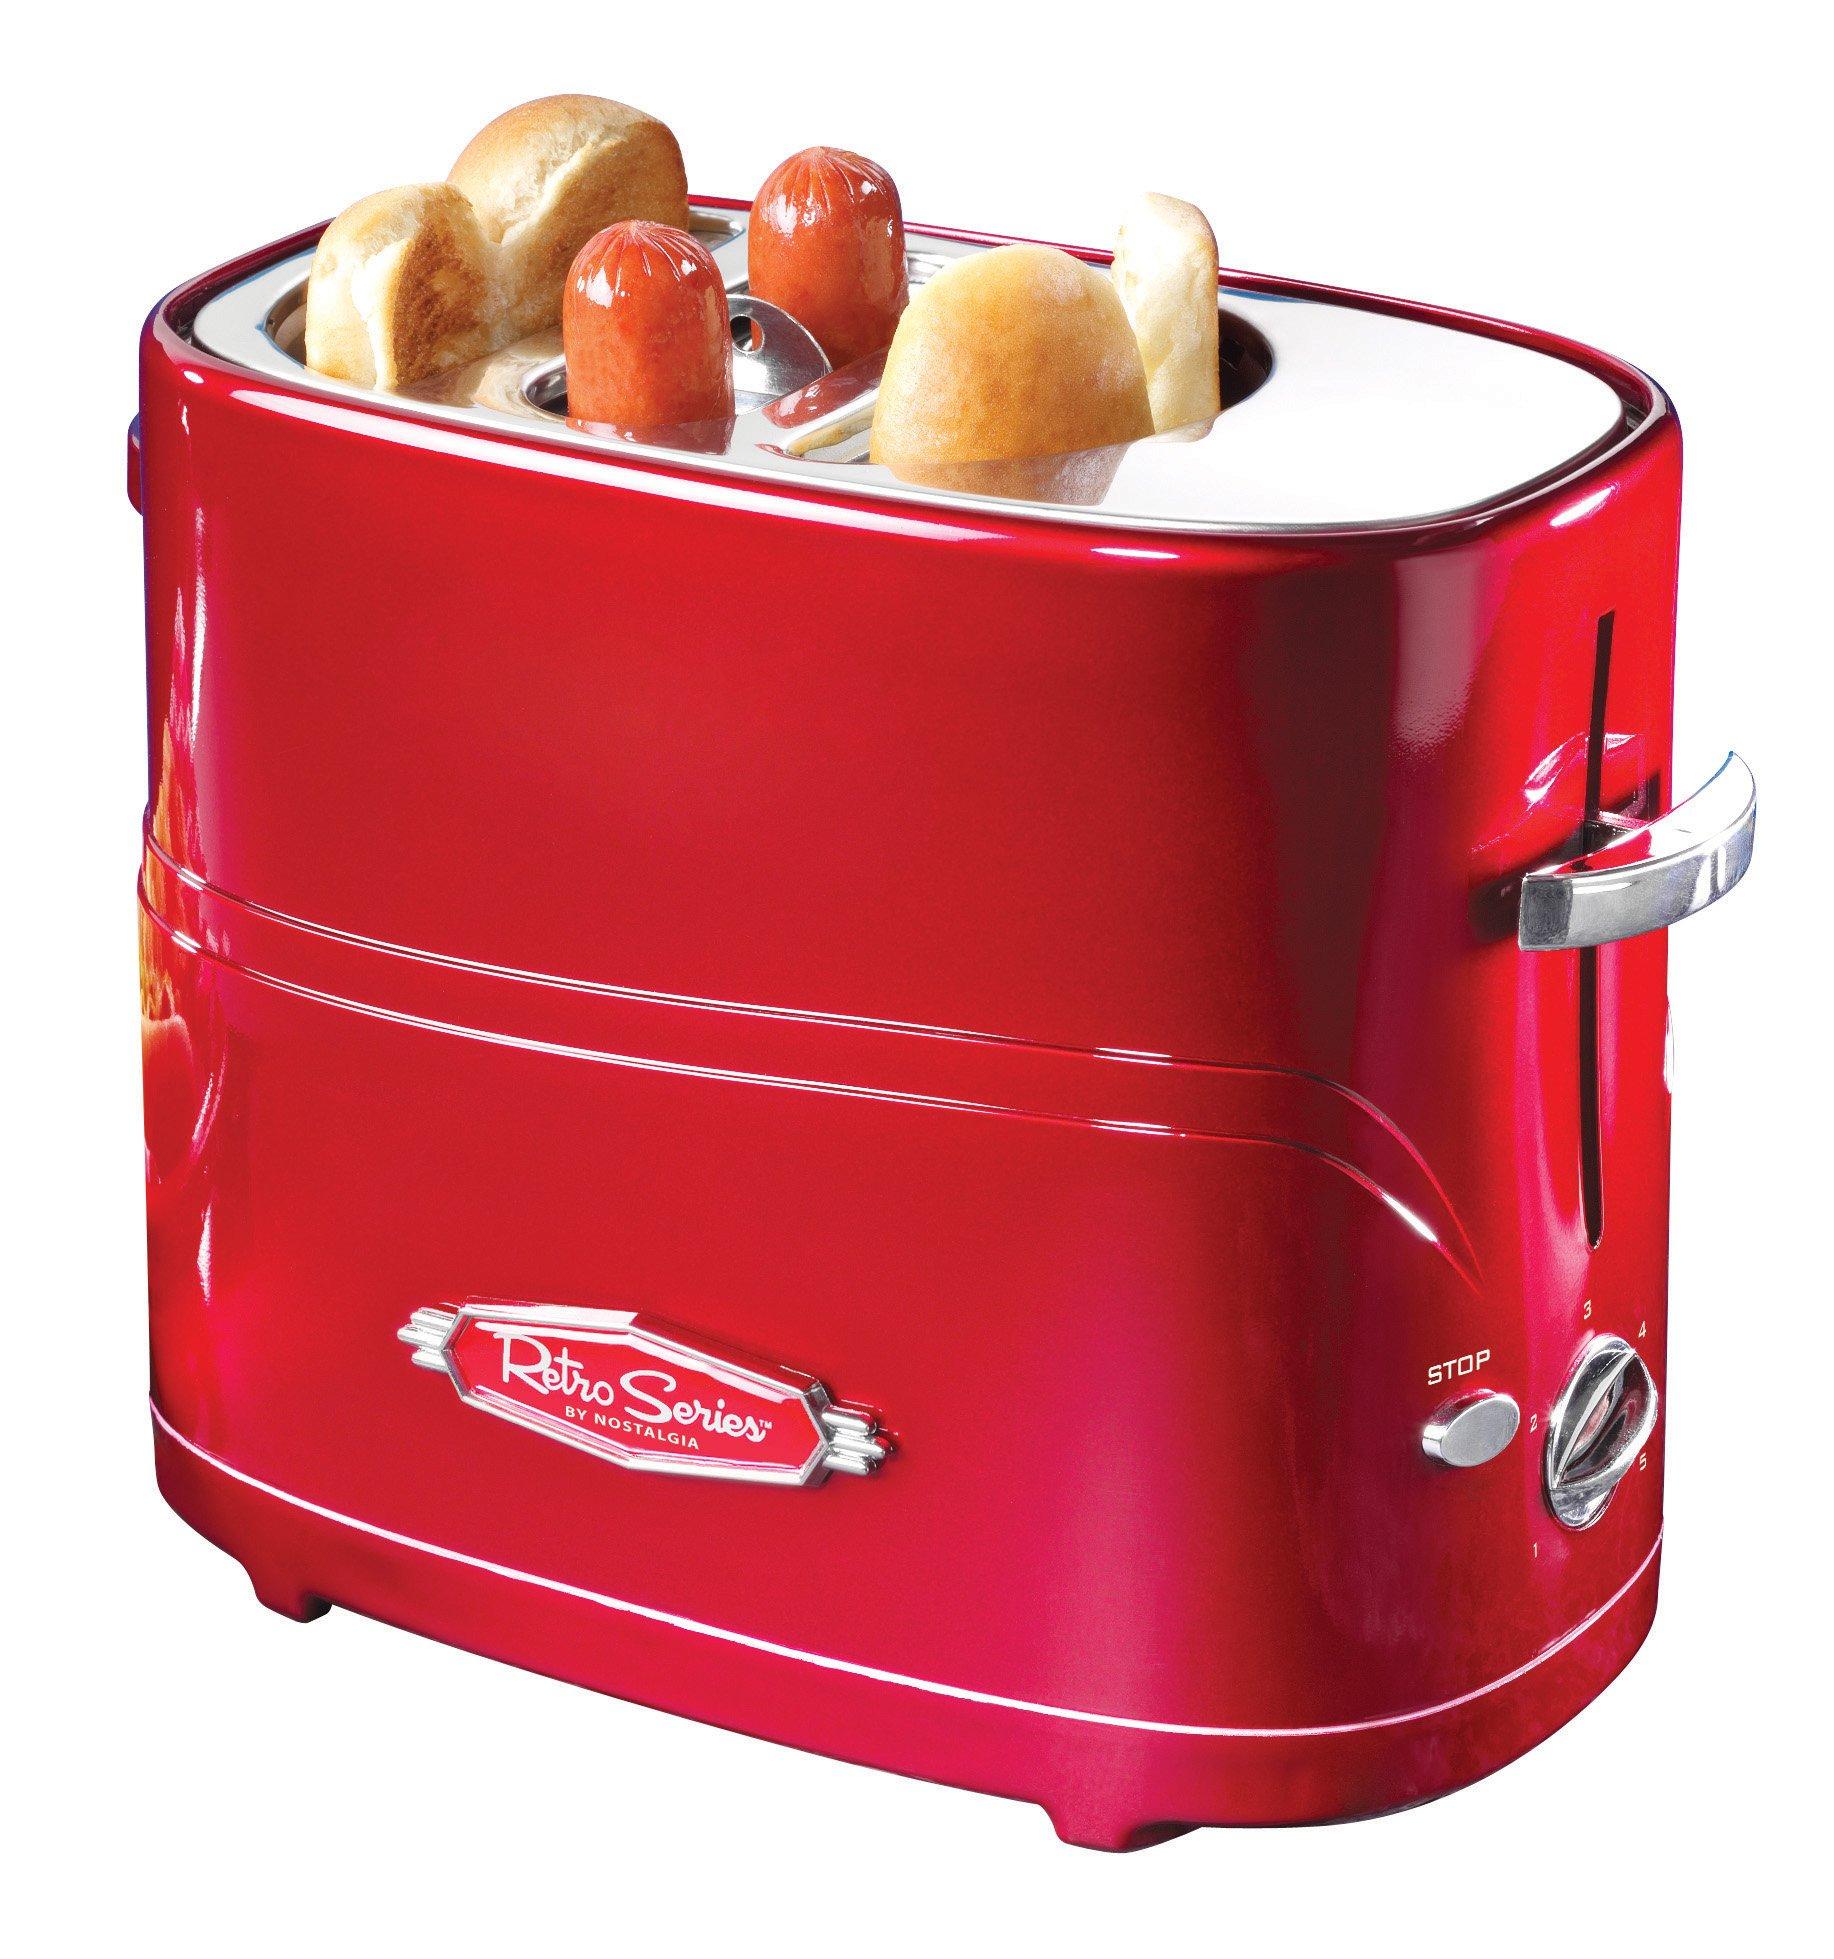 Nostalgia Retro Pop-Up Hot Dog Toaster by Nostalgia